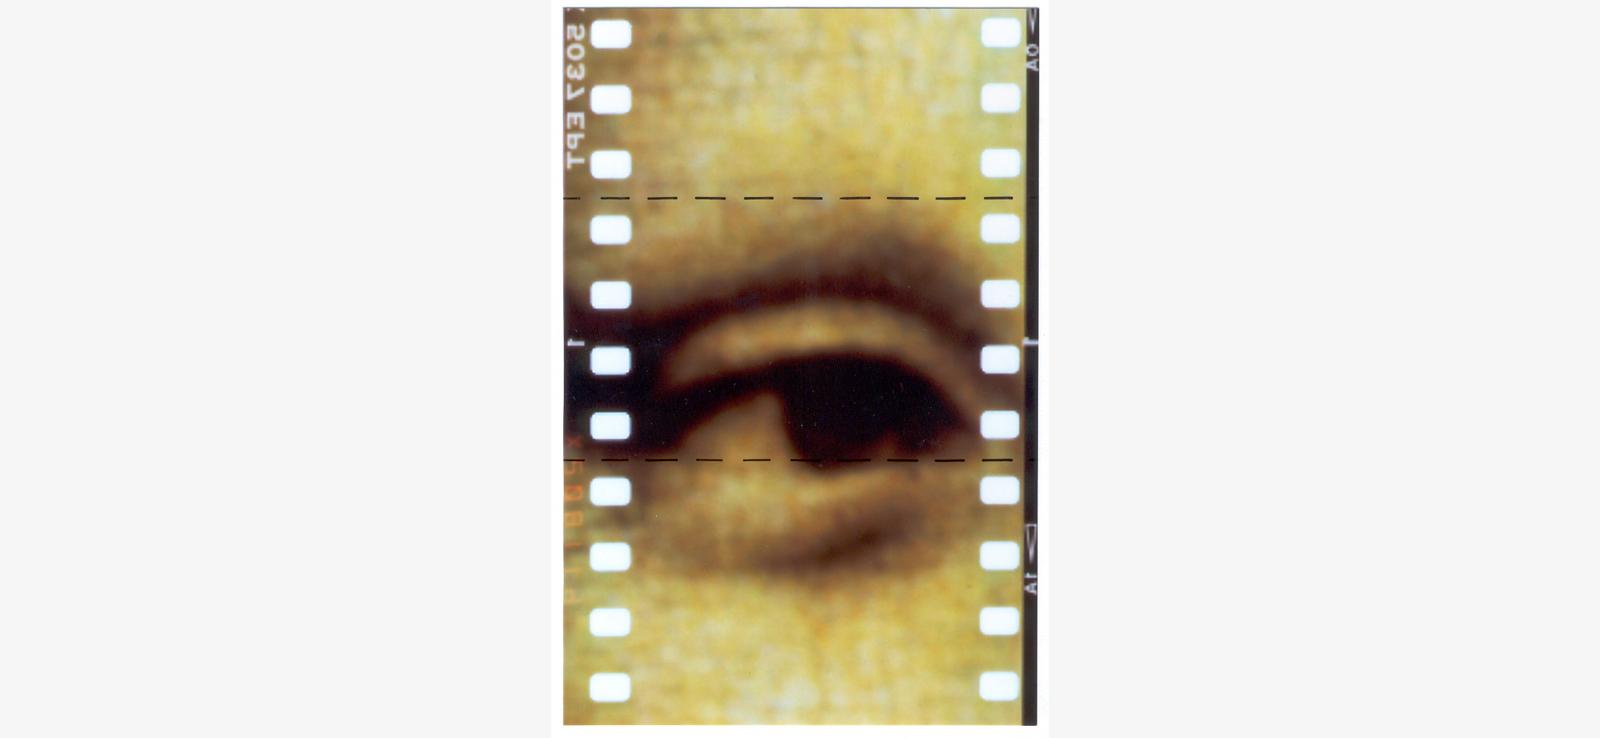 Antoni-Pinent-filmmaker-GIOCONDA-FILM-mutuation